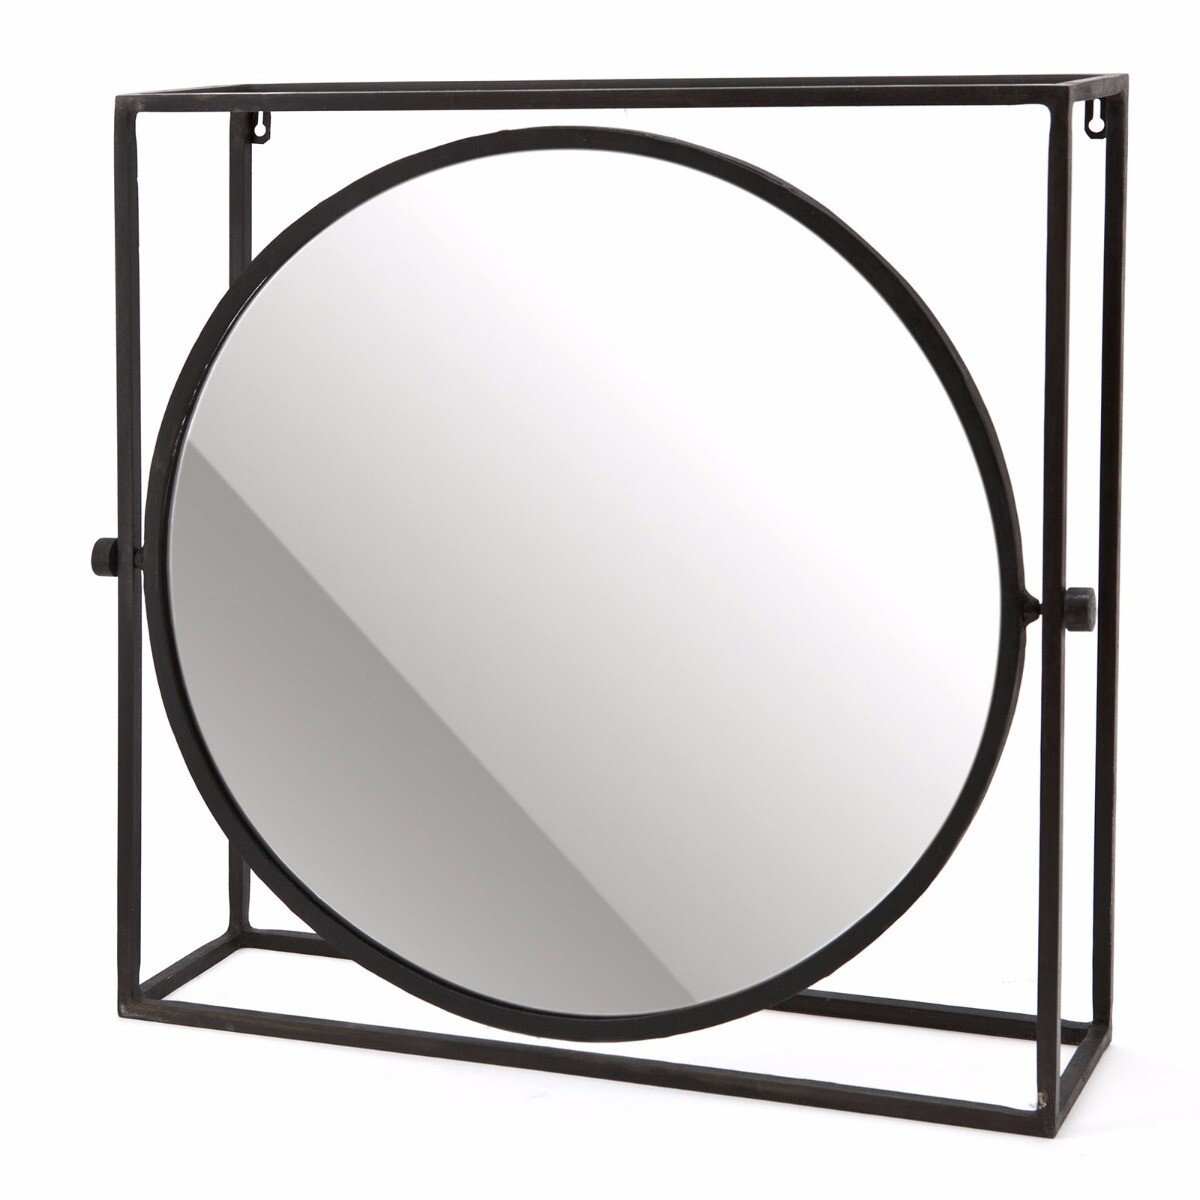 By Boo spiegel in frame rond 50x52x13cm